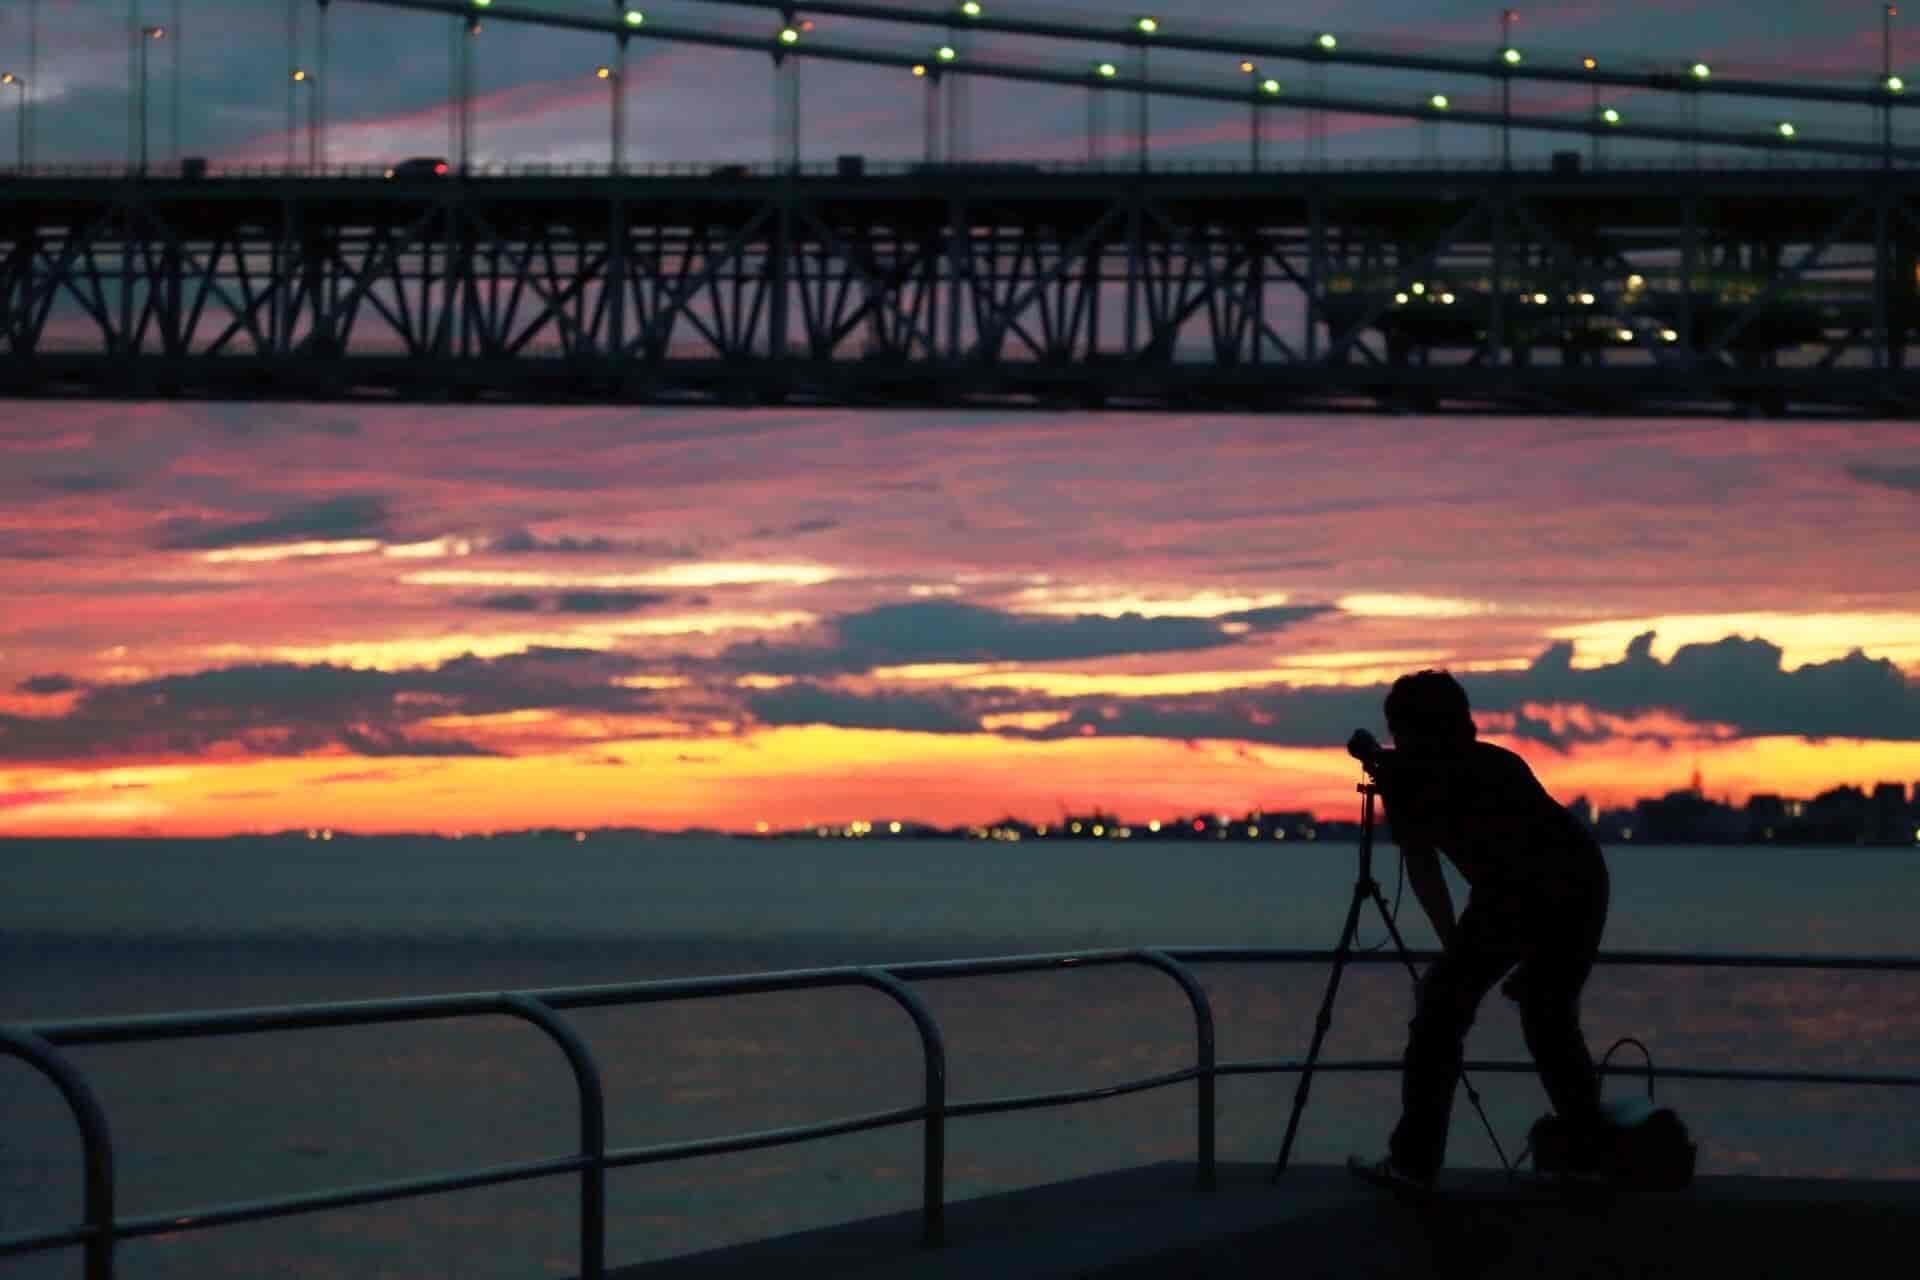 ラブ探偵事務所と他社の千葉県九十九里町での夜間暗視撮影